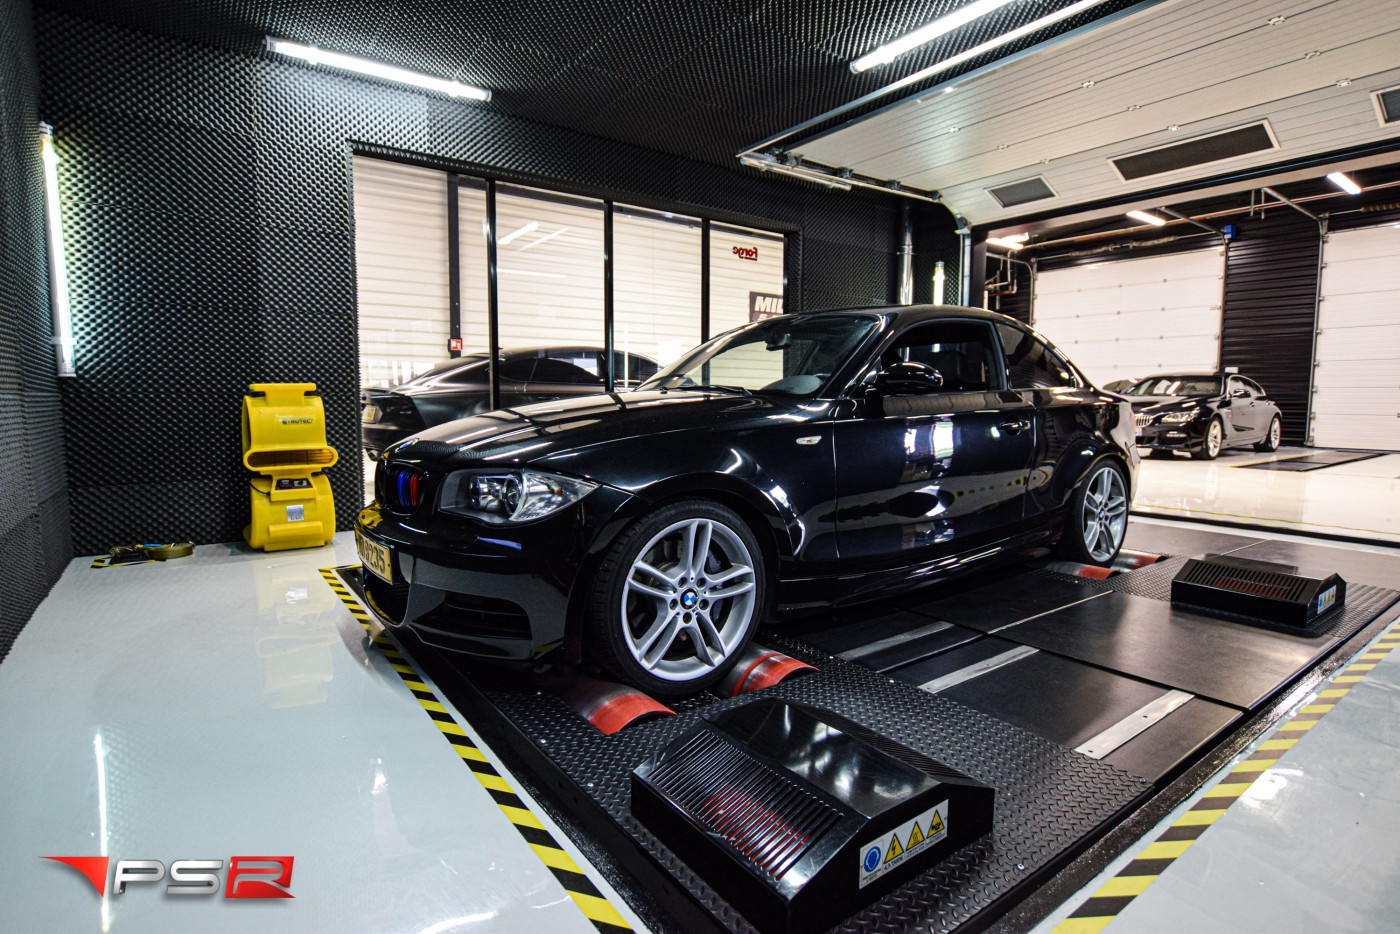 BMW 135 i coupée 306 HP TUNE